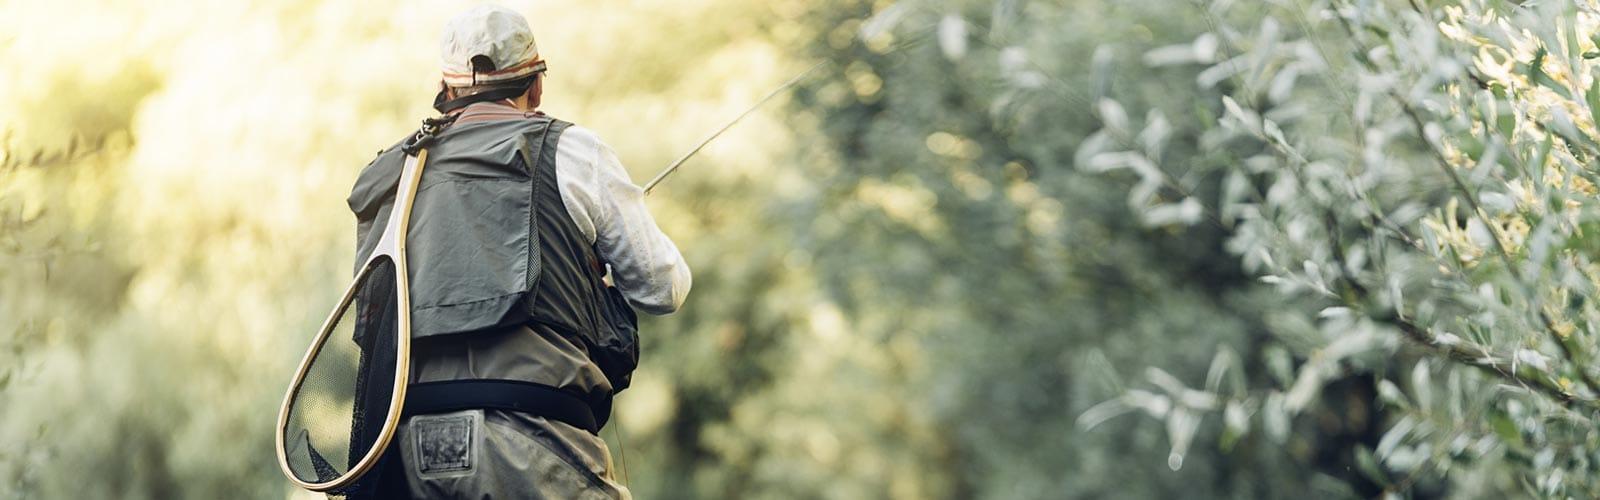 Fishing Clothing